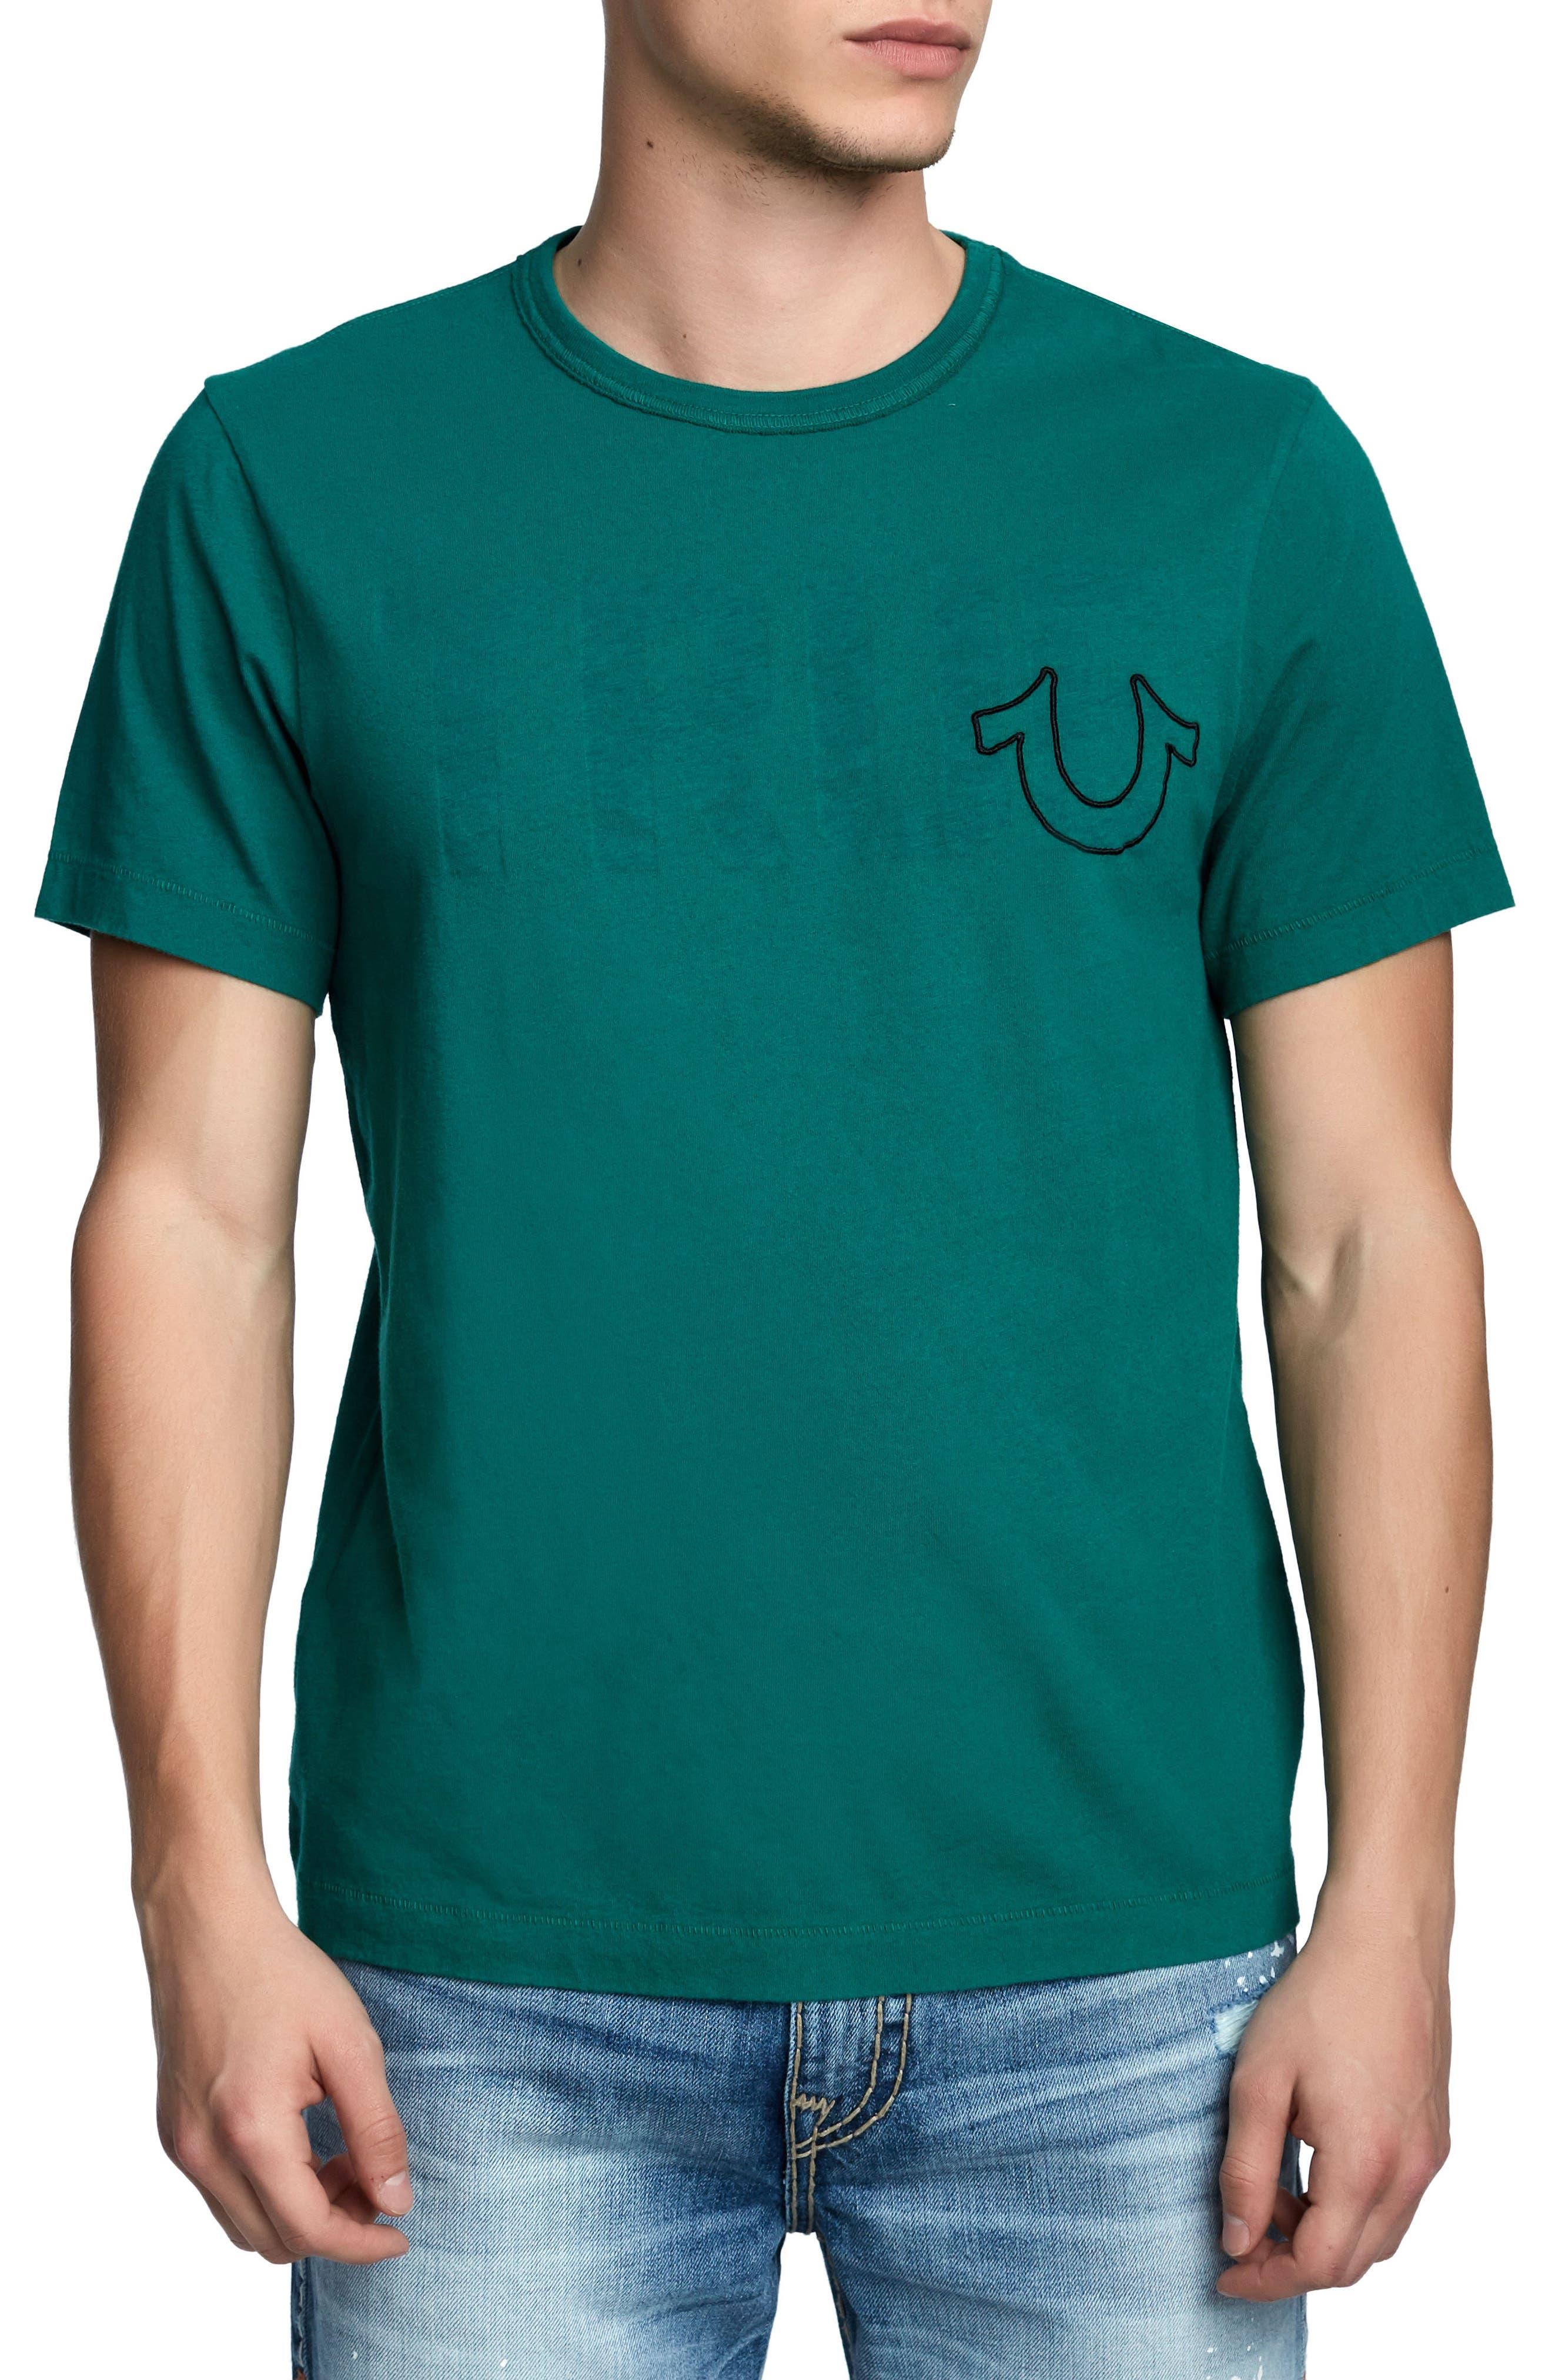 True Slogan T-Shirt,                             Main thumbnail 1, color,                             DARK AGAVE